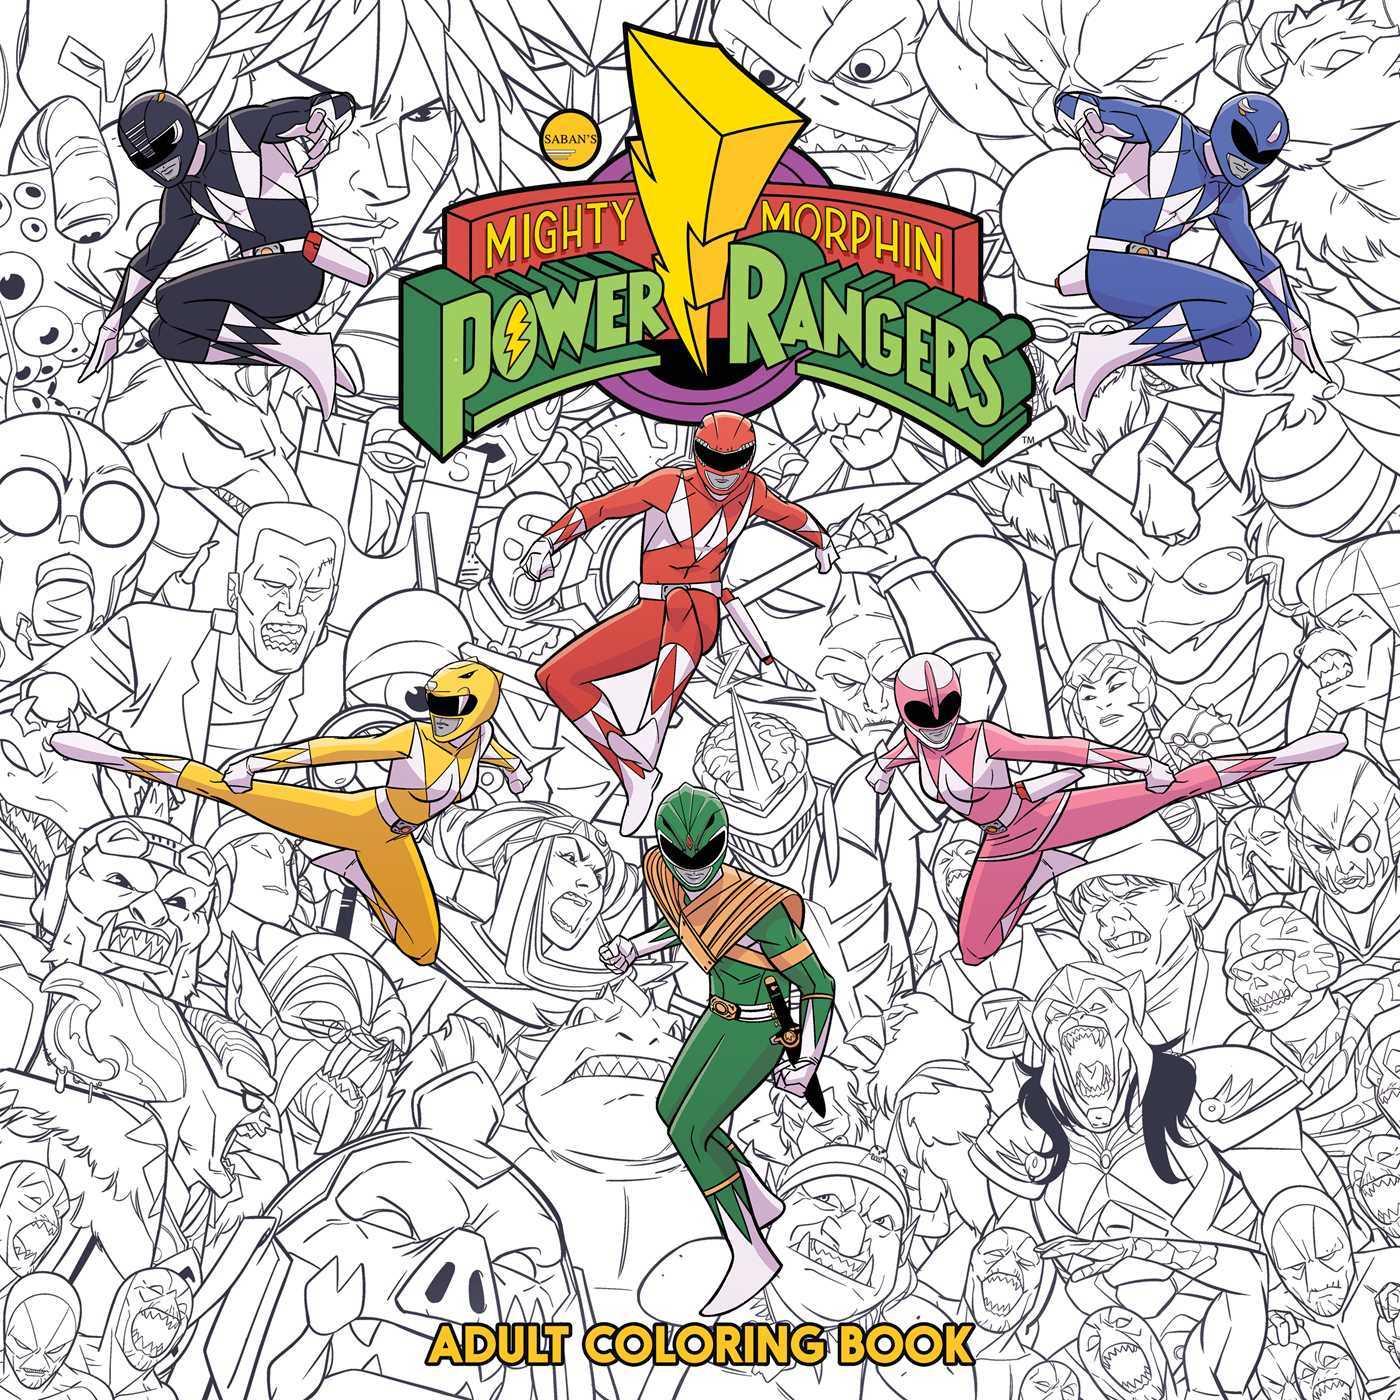 Mighty Morphin Power Rangers Adult Coloring Book by Hendry Pratsetya